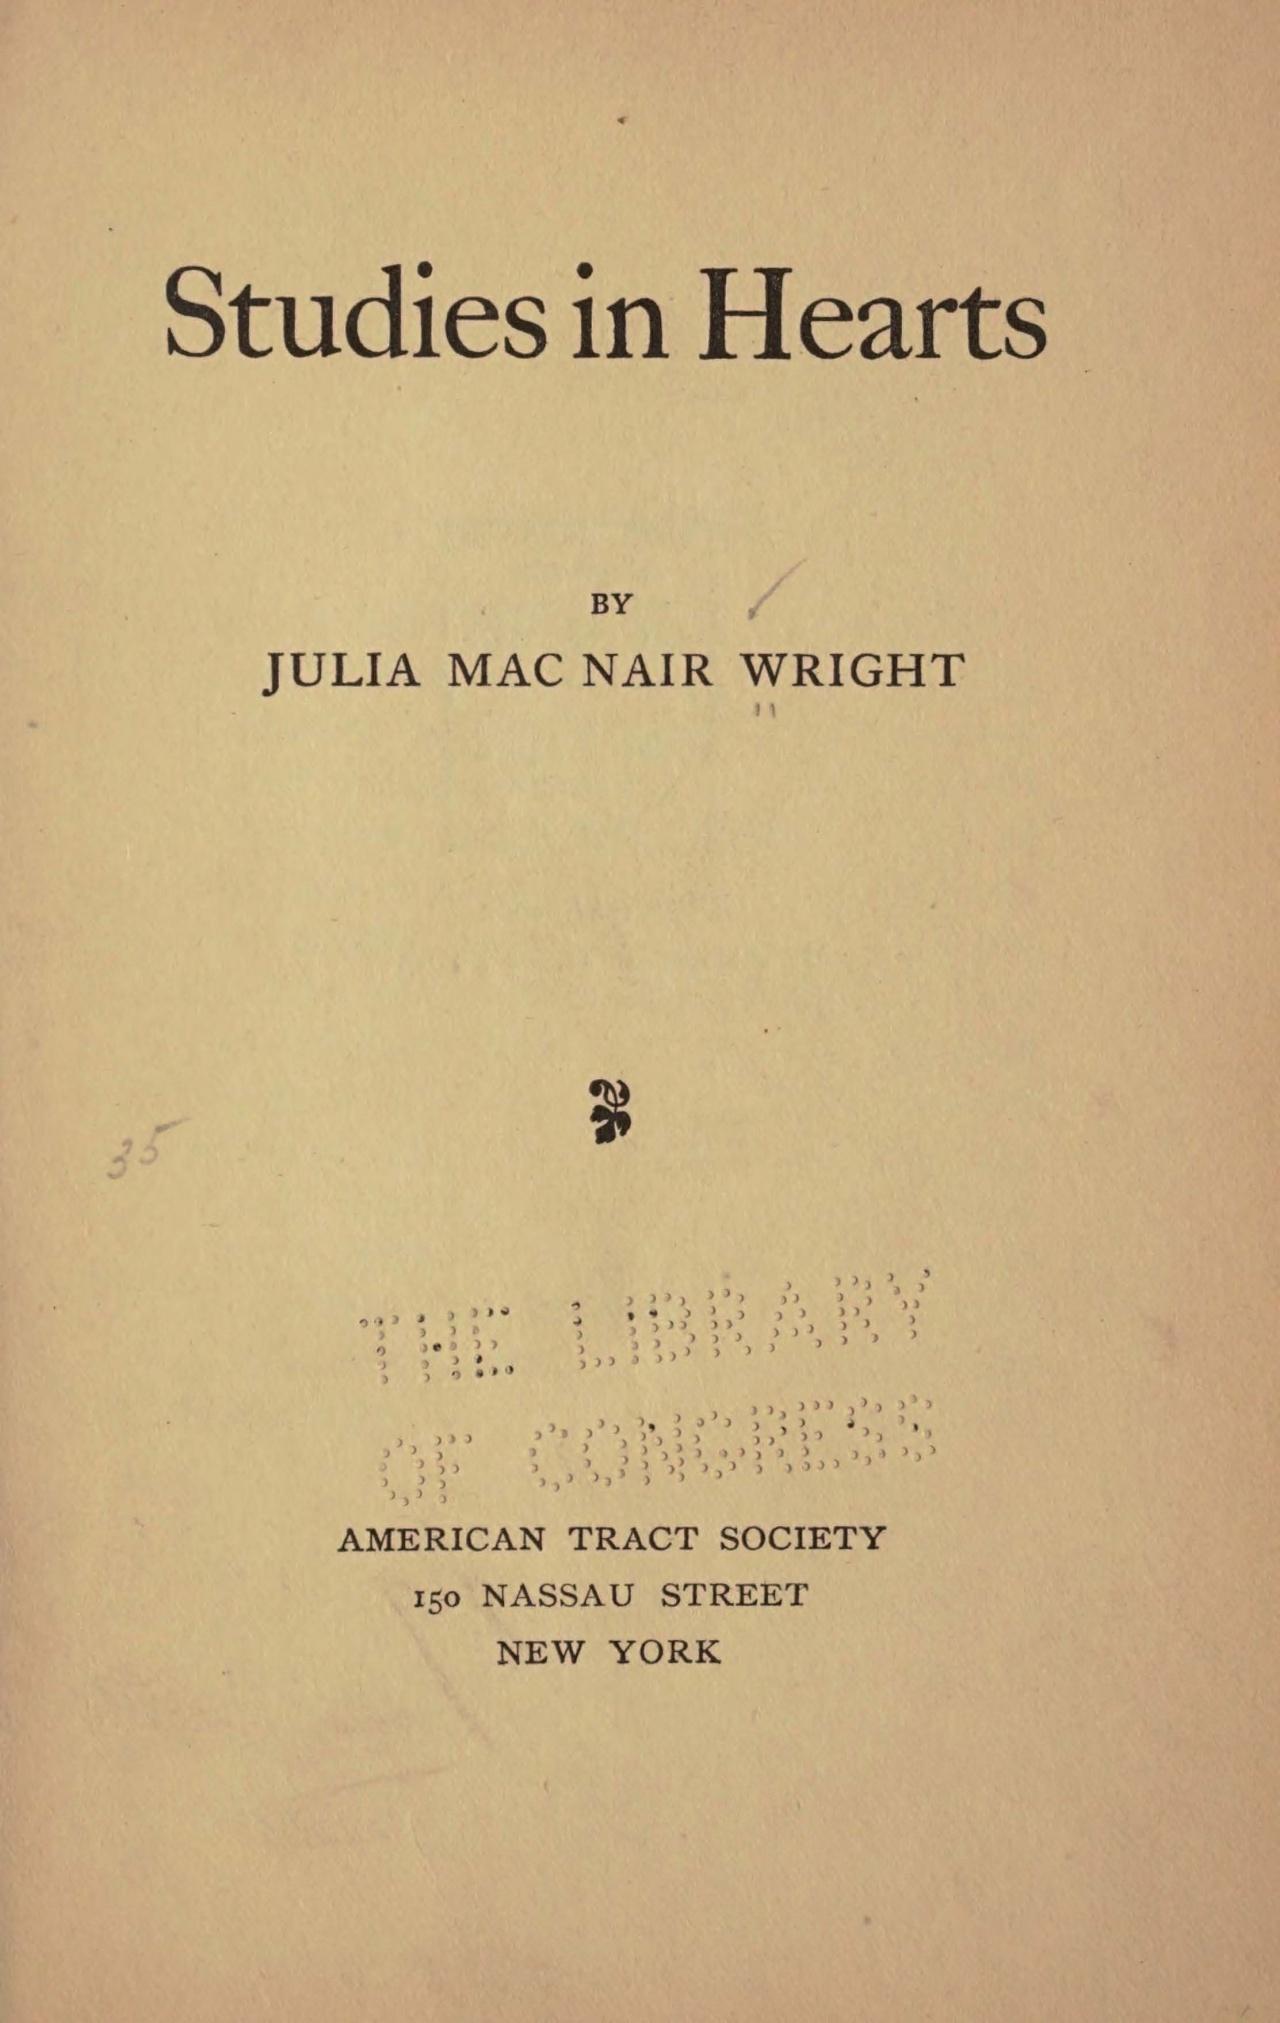 Wright, Julia McNair, Studies in Hearts Title Page.jpg